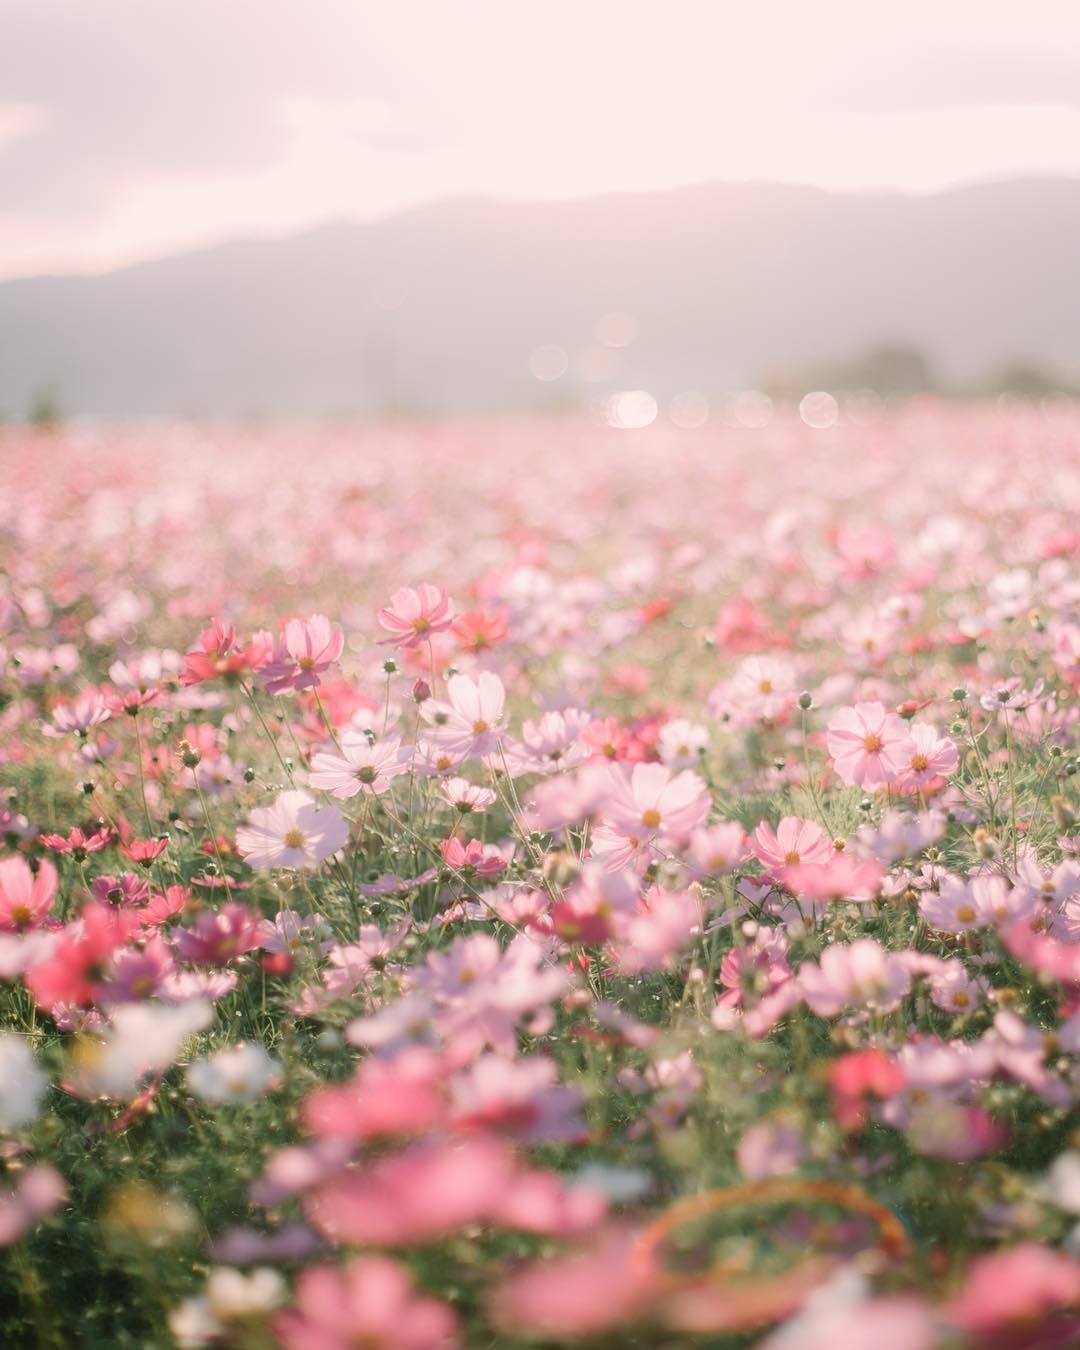 Pink Flowers Aesthetic Wallpapers Top Free Pink Flowers Aesthetic Backgrounds Wallpaperaccess